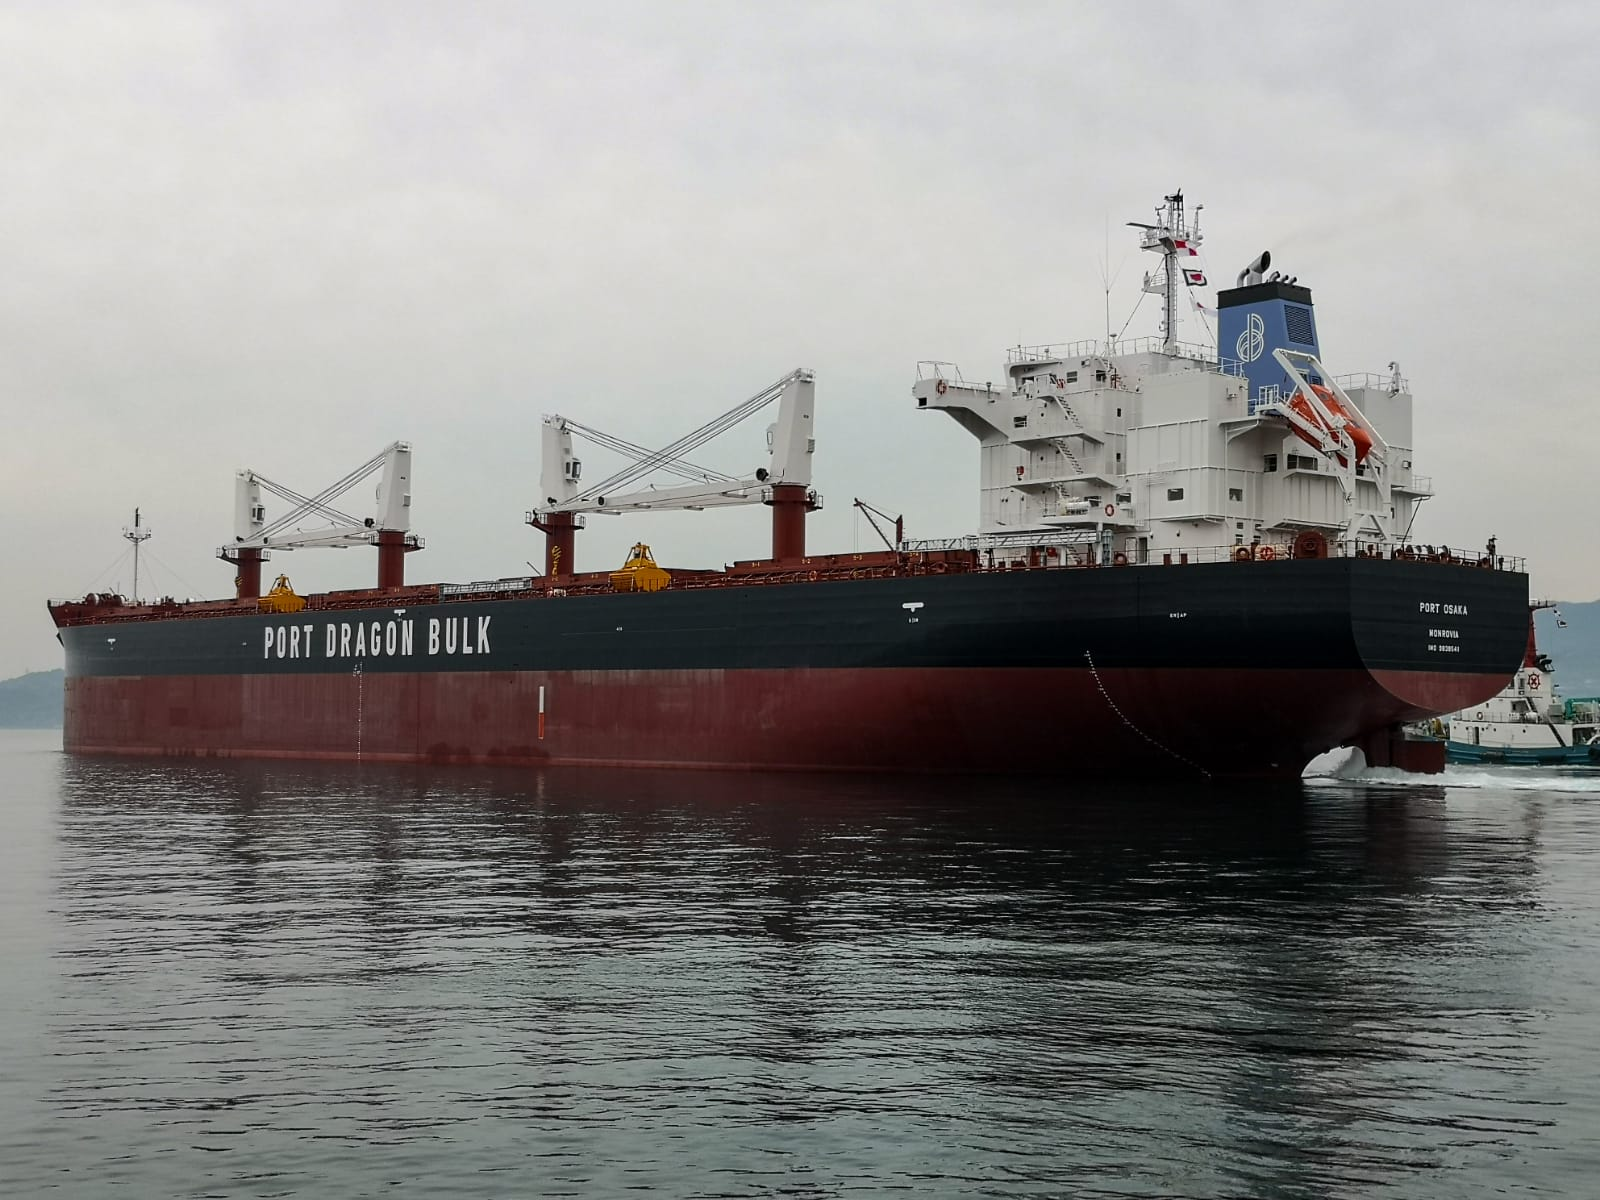 A Portline Bulk soma 19 navios sob gestão